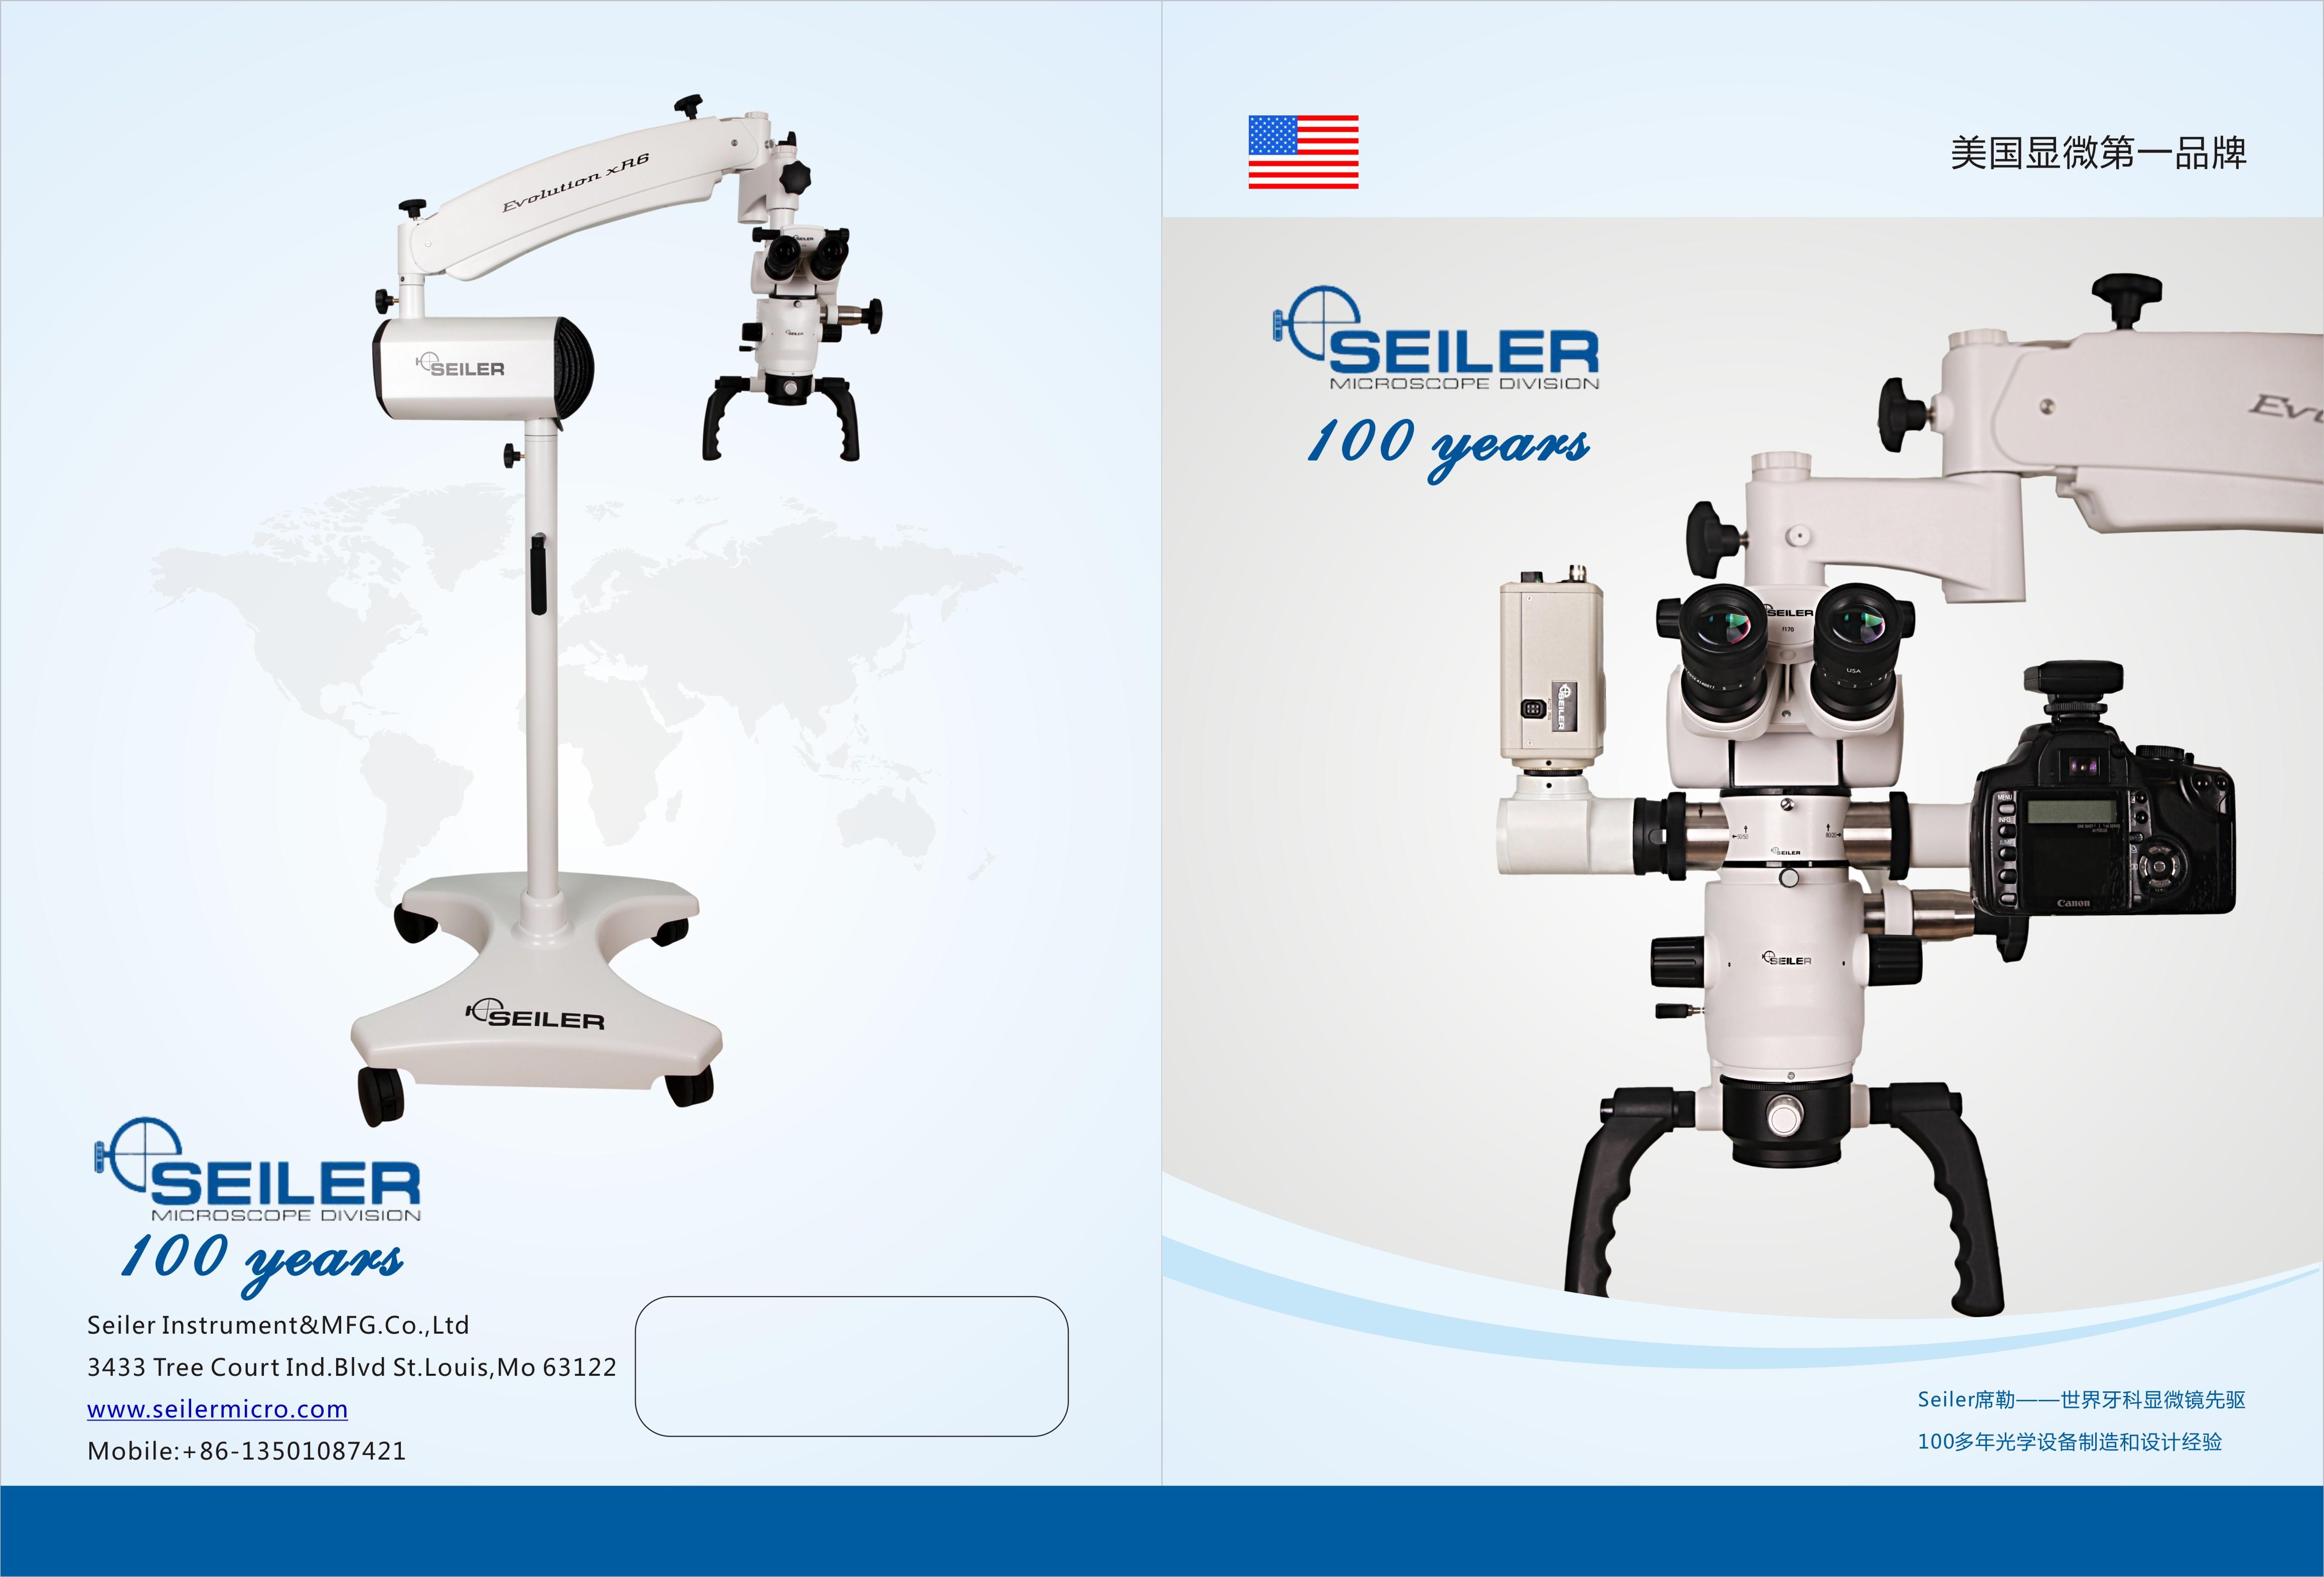 Foreign Microscope Brochure